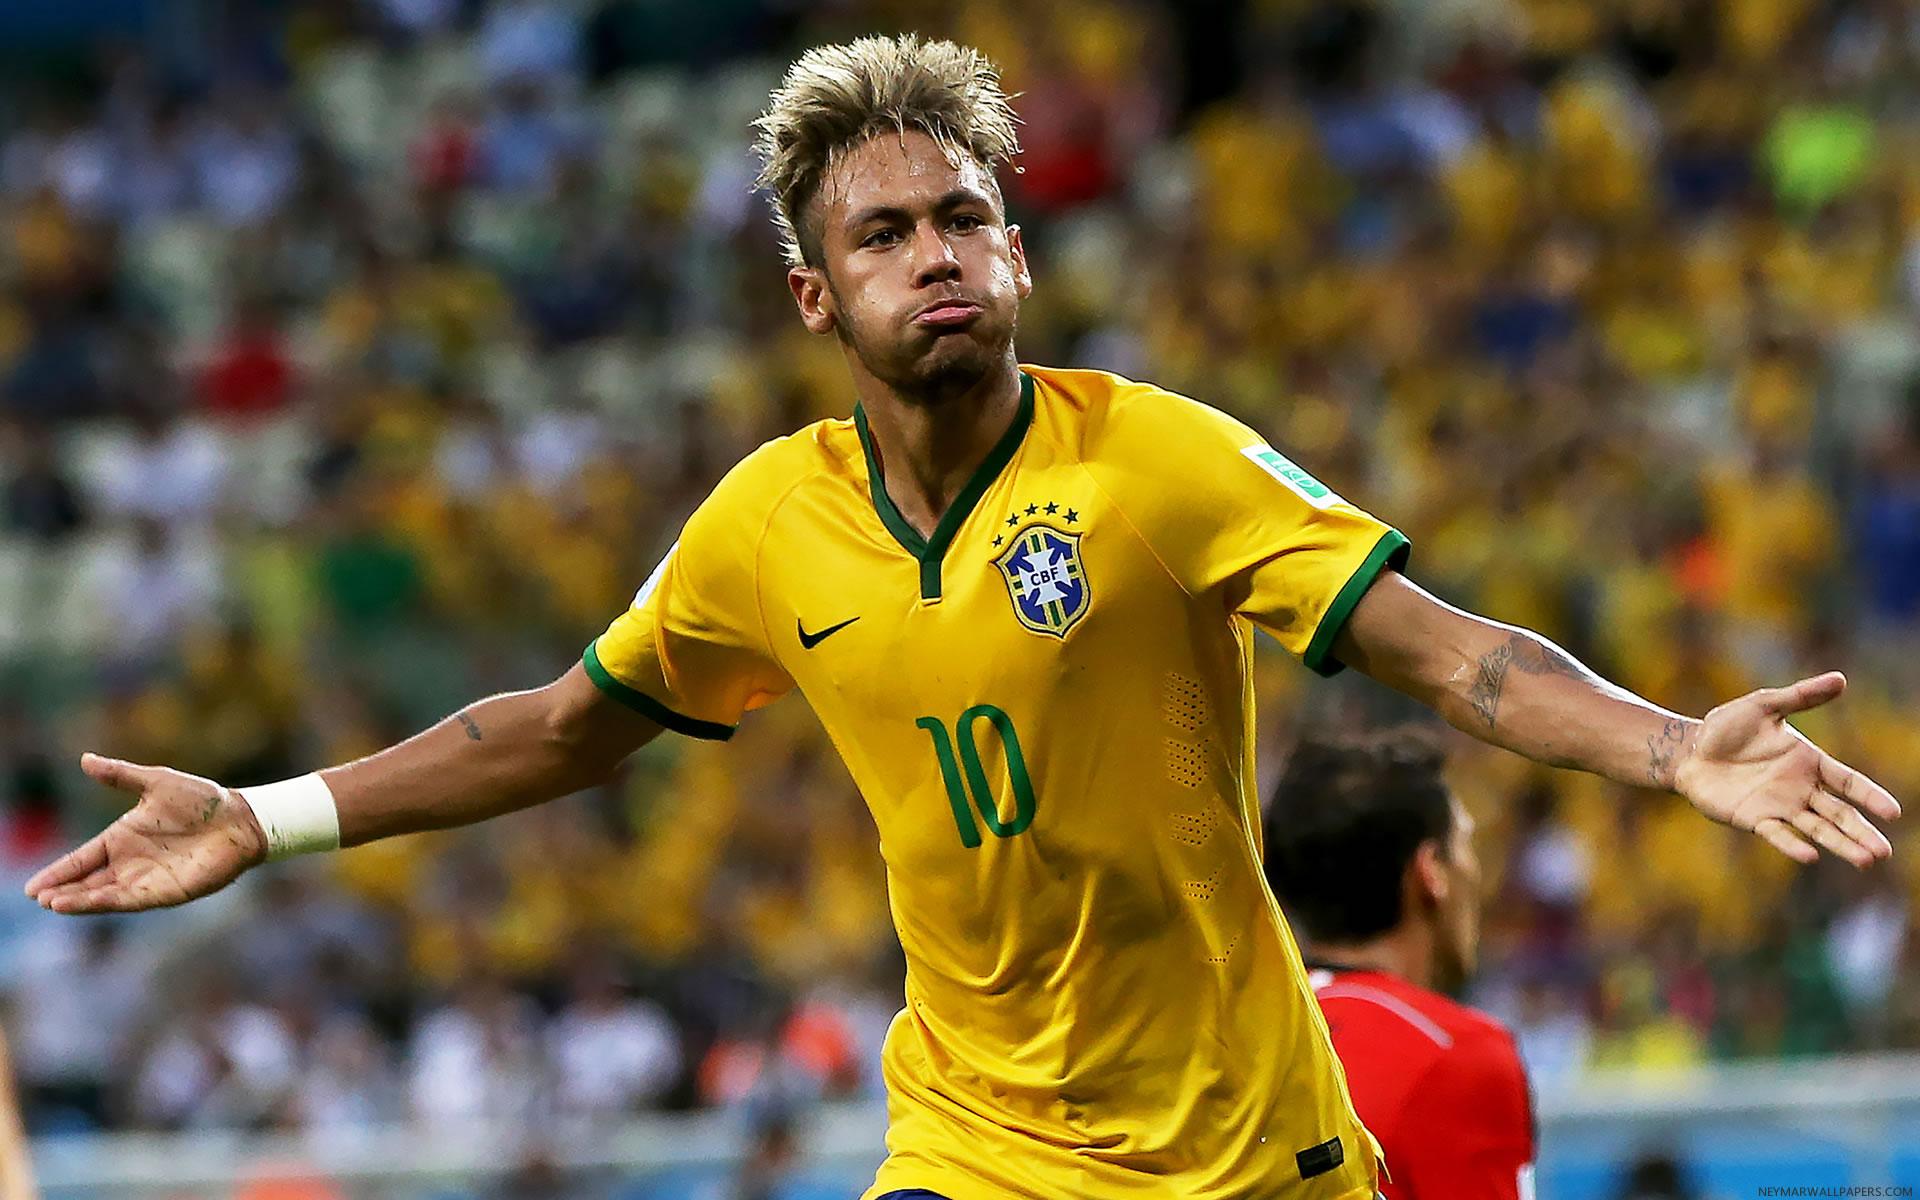 Neymar brazil wallpaper 2014